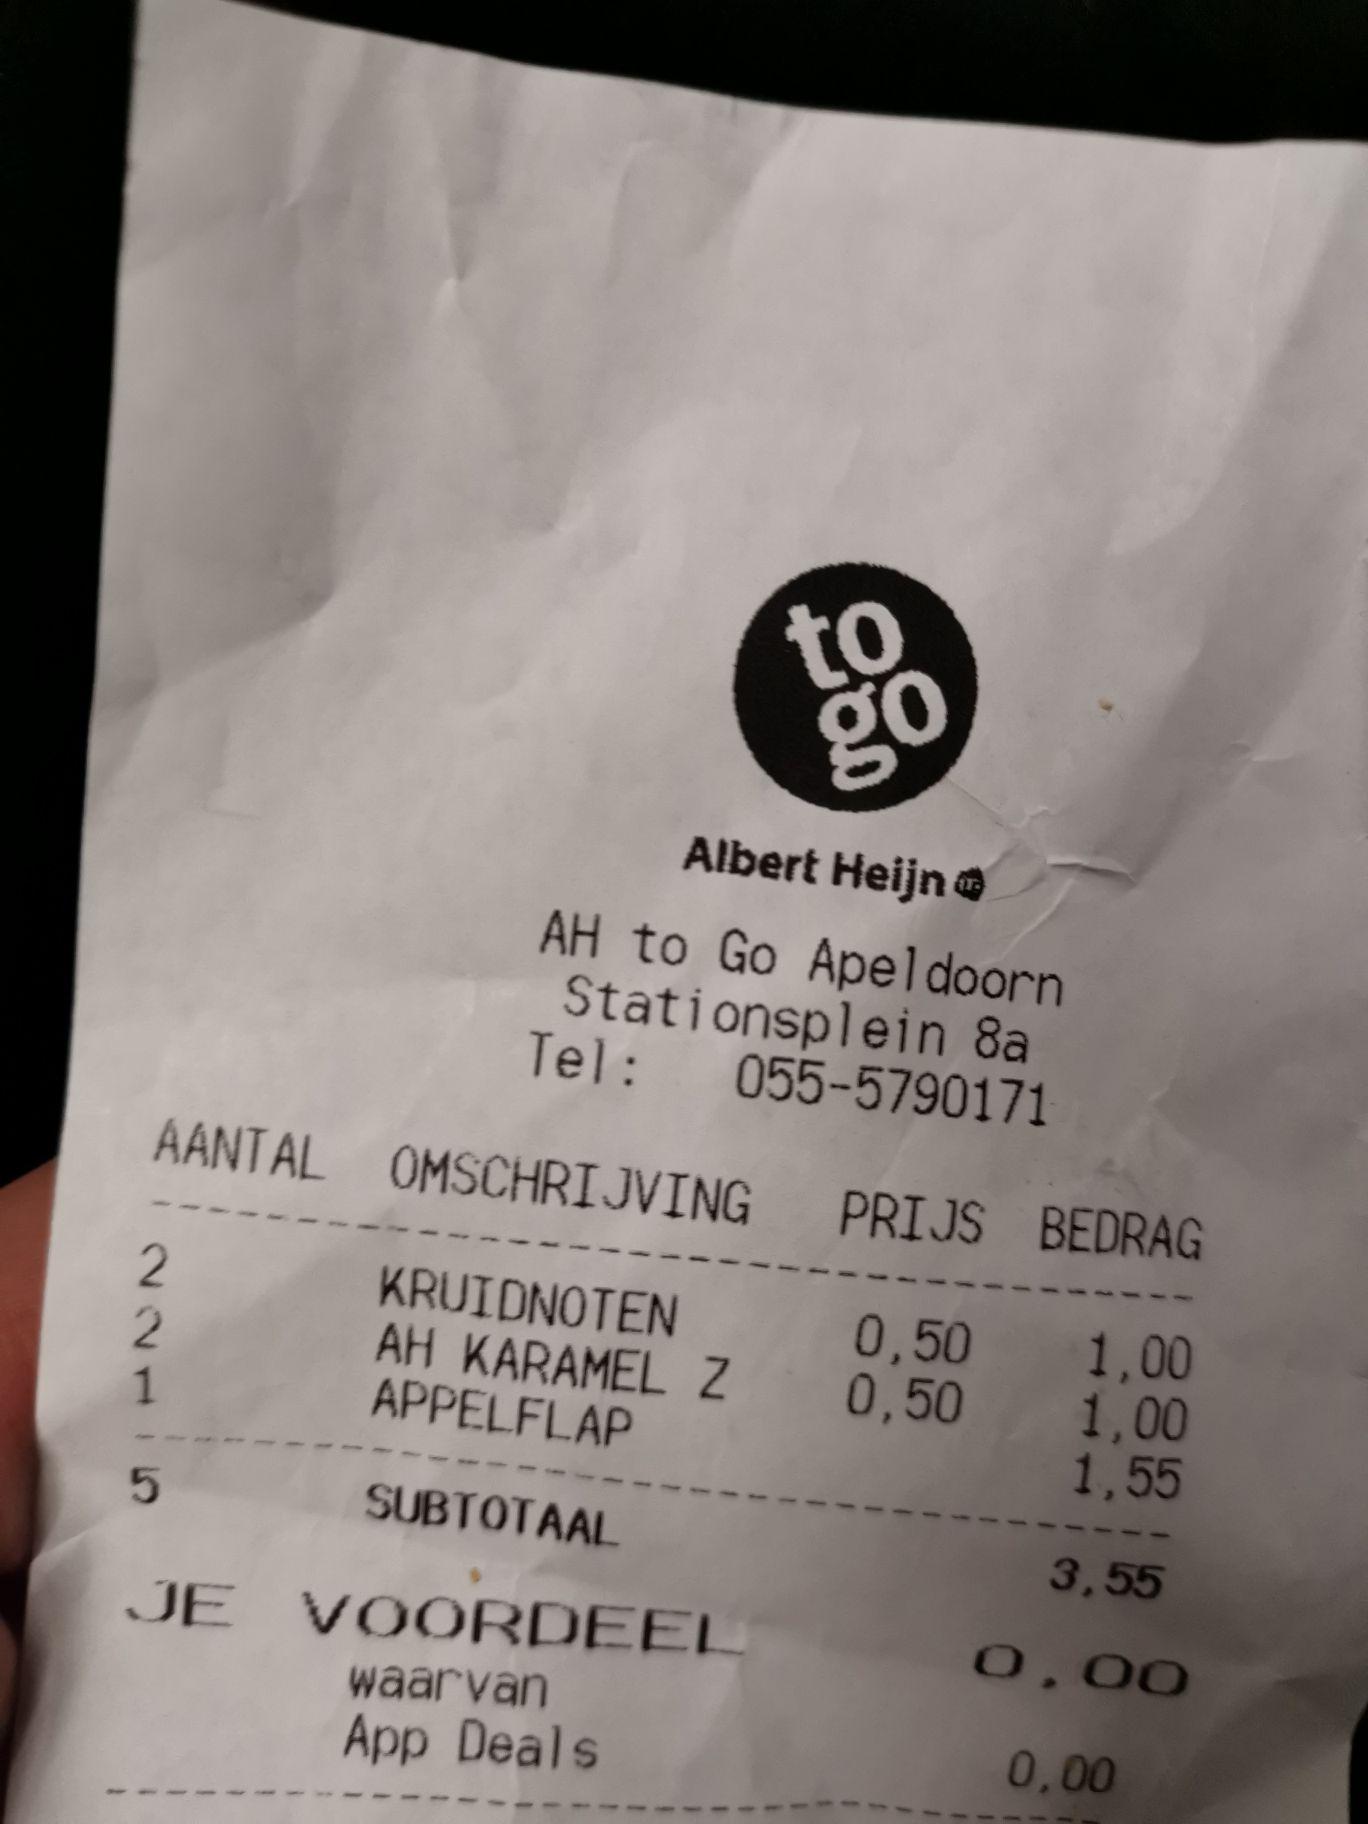 [lokaal] Apeldoorn ah to go chocolade kruidnoten